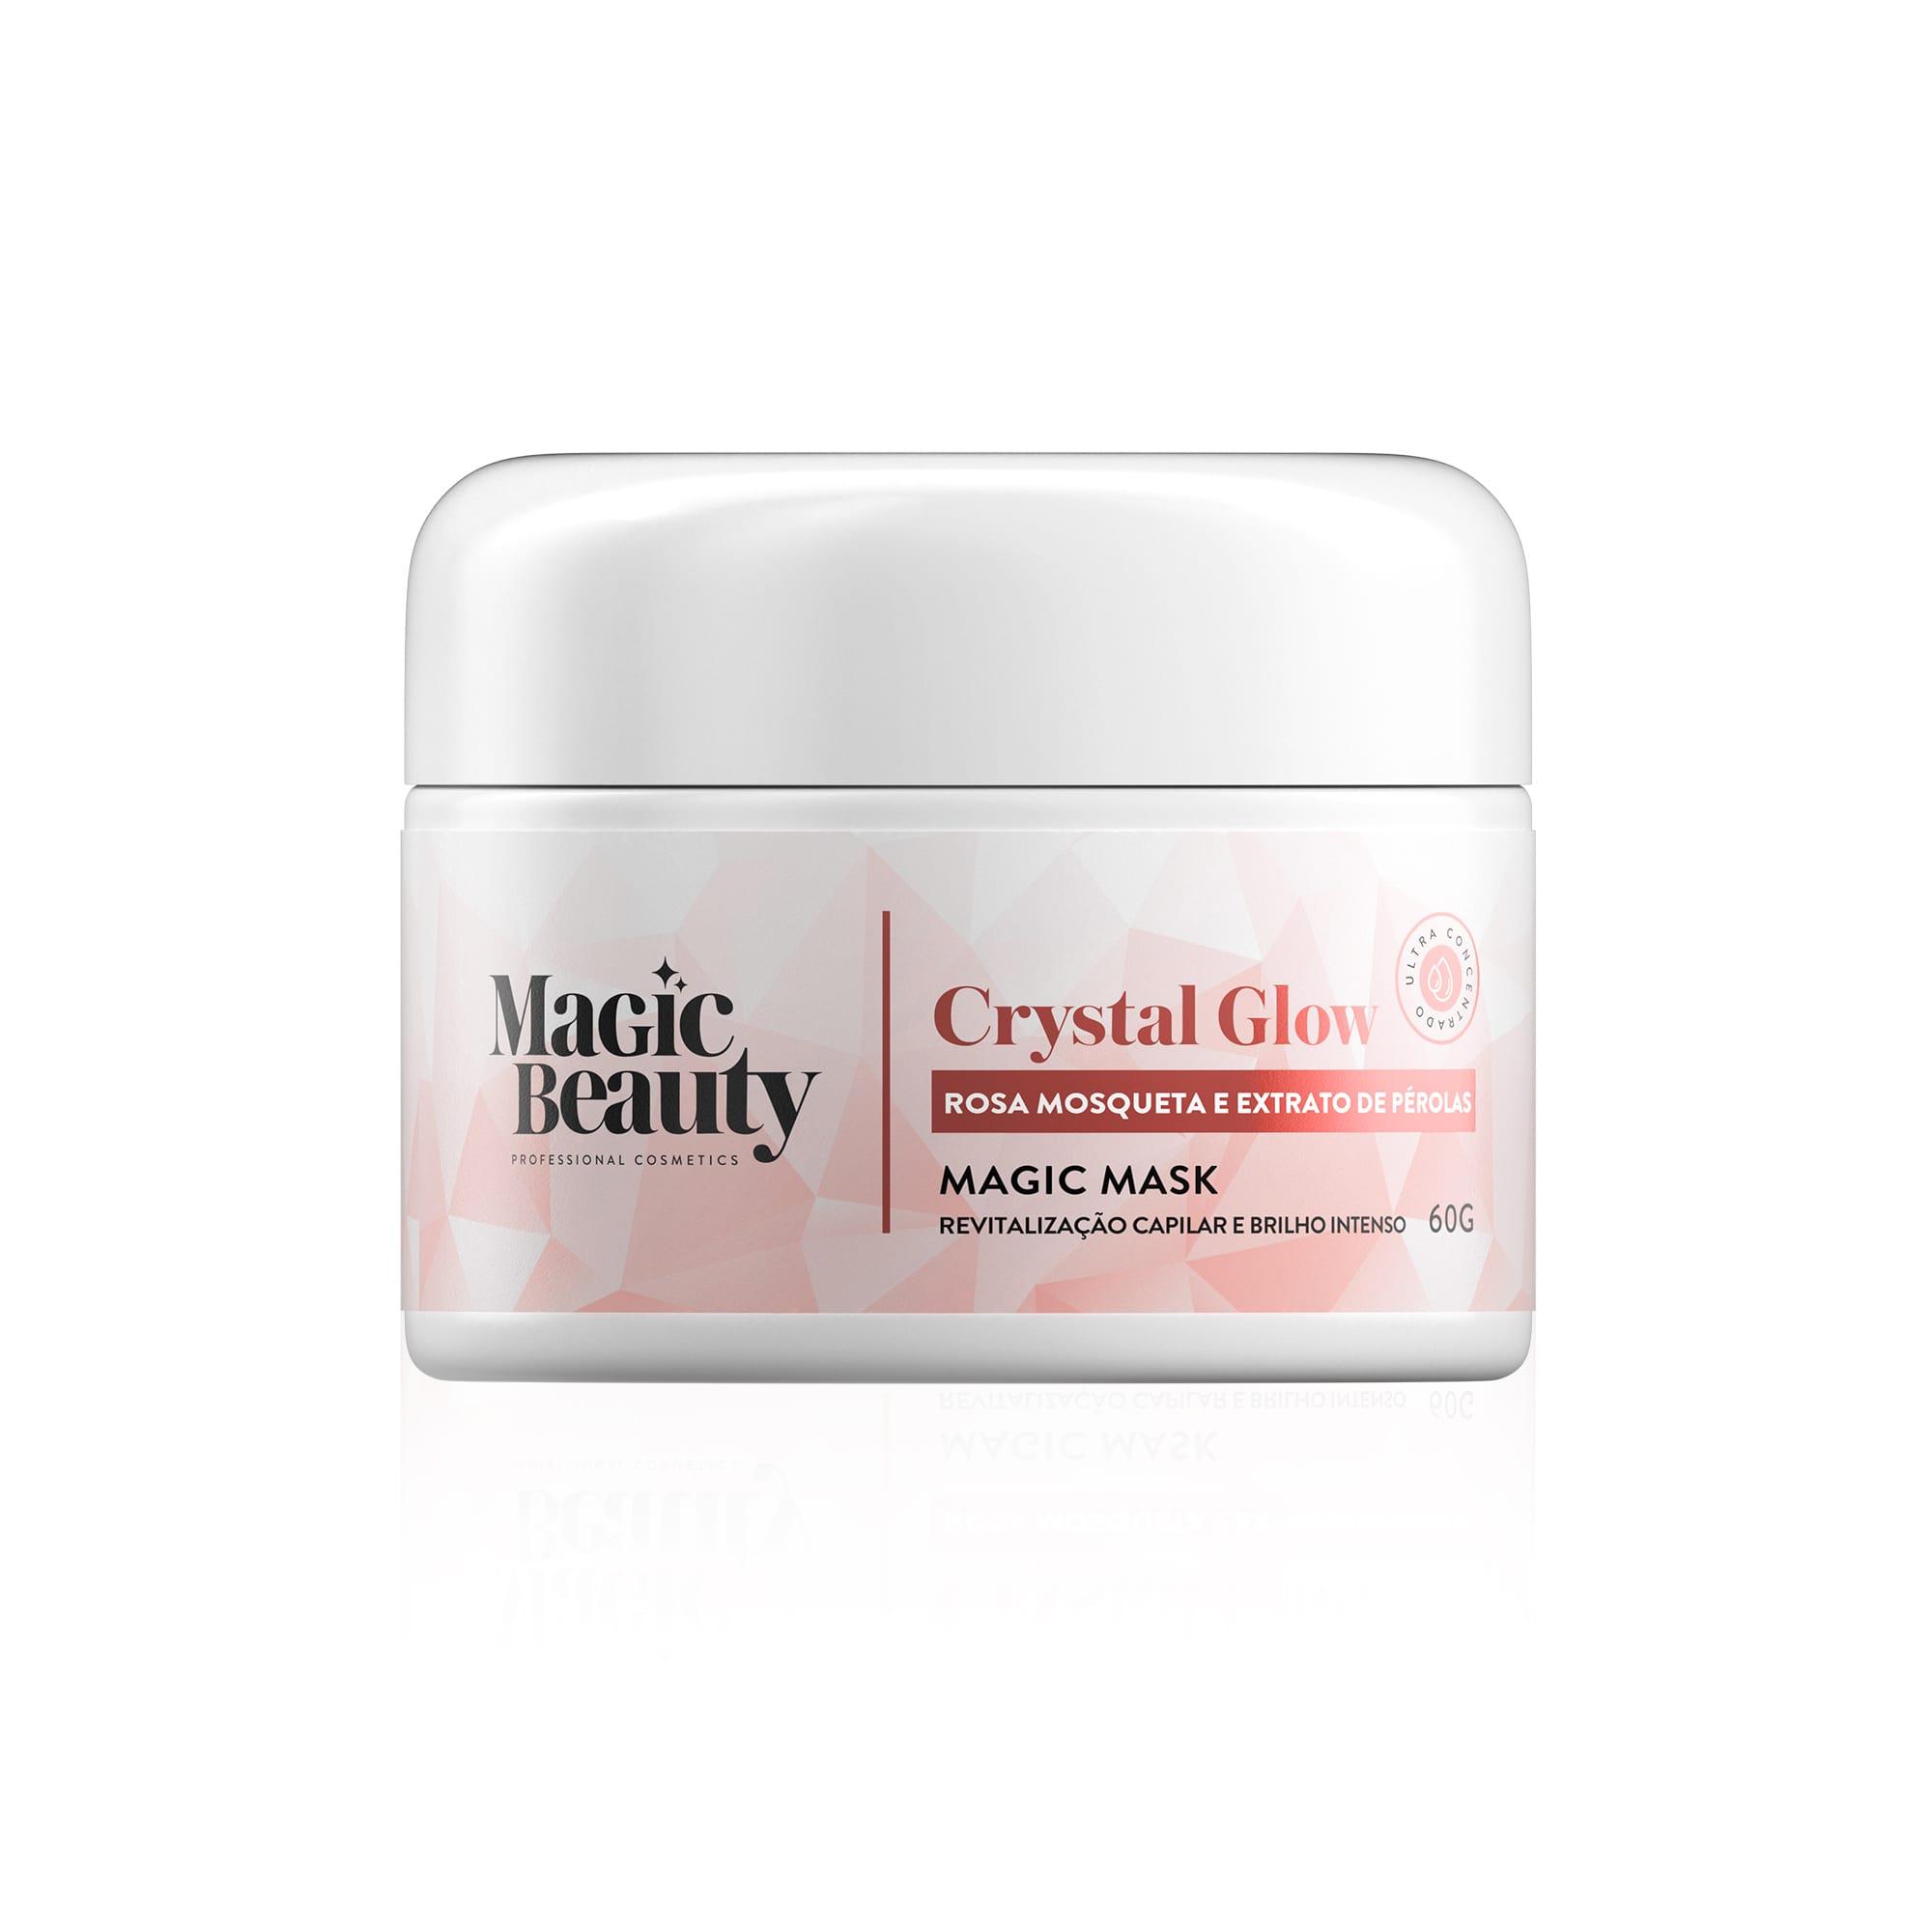 Magic Beauty Crystal Glow Revitalização e Brilho intenso Mini Máscara 60gr